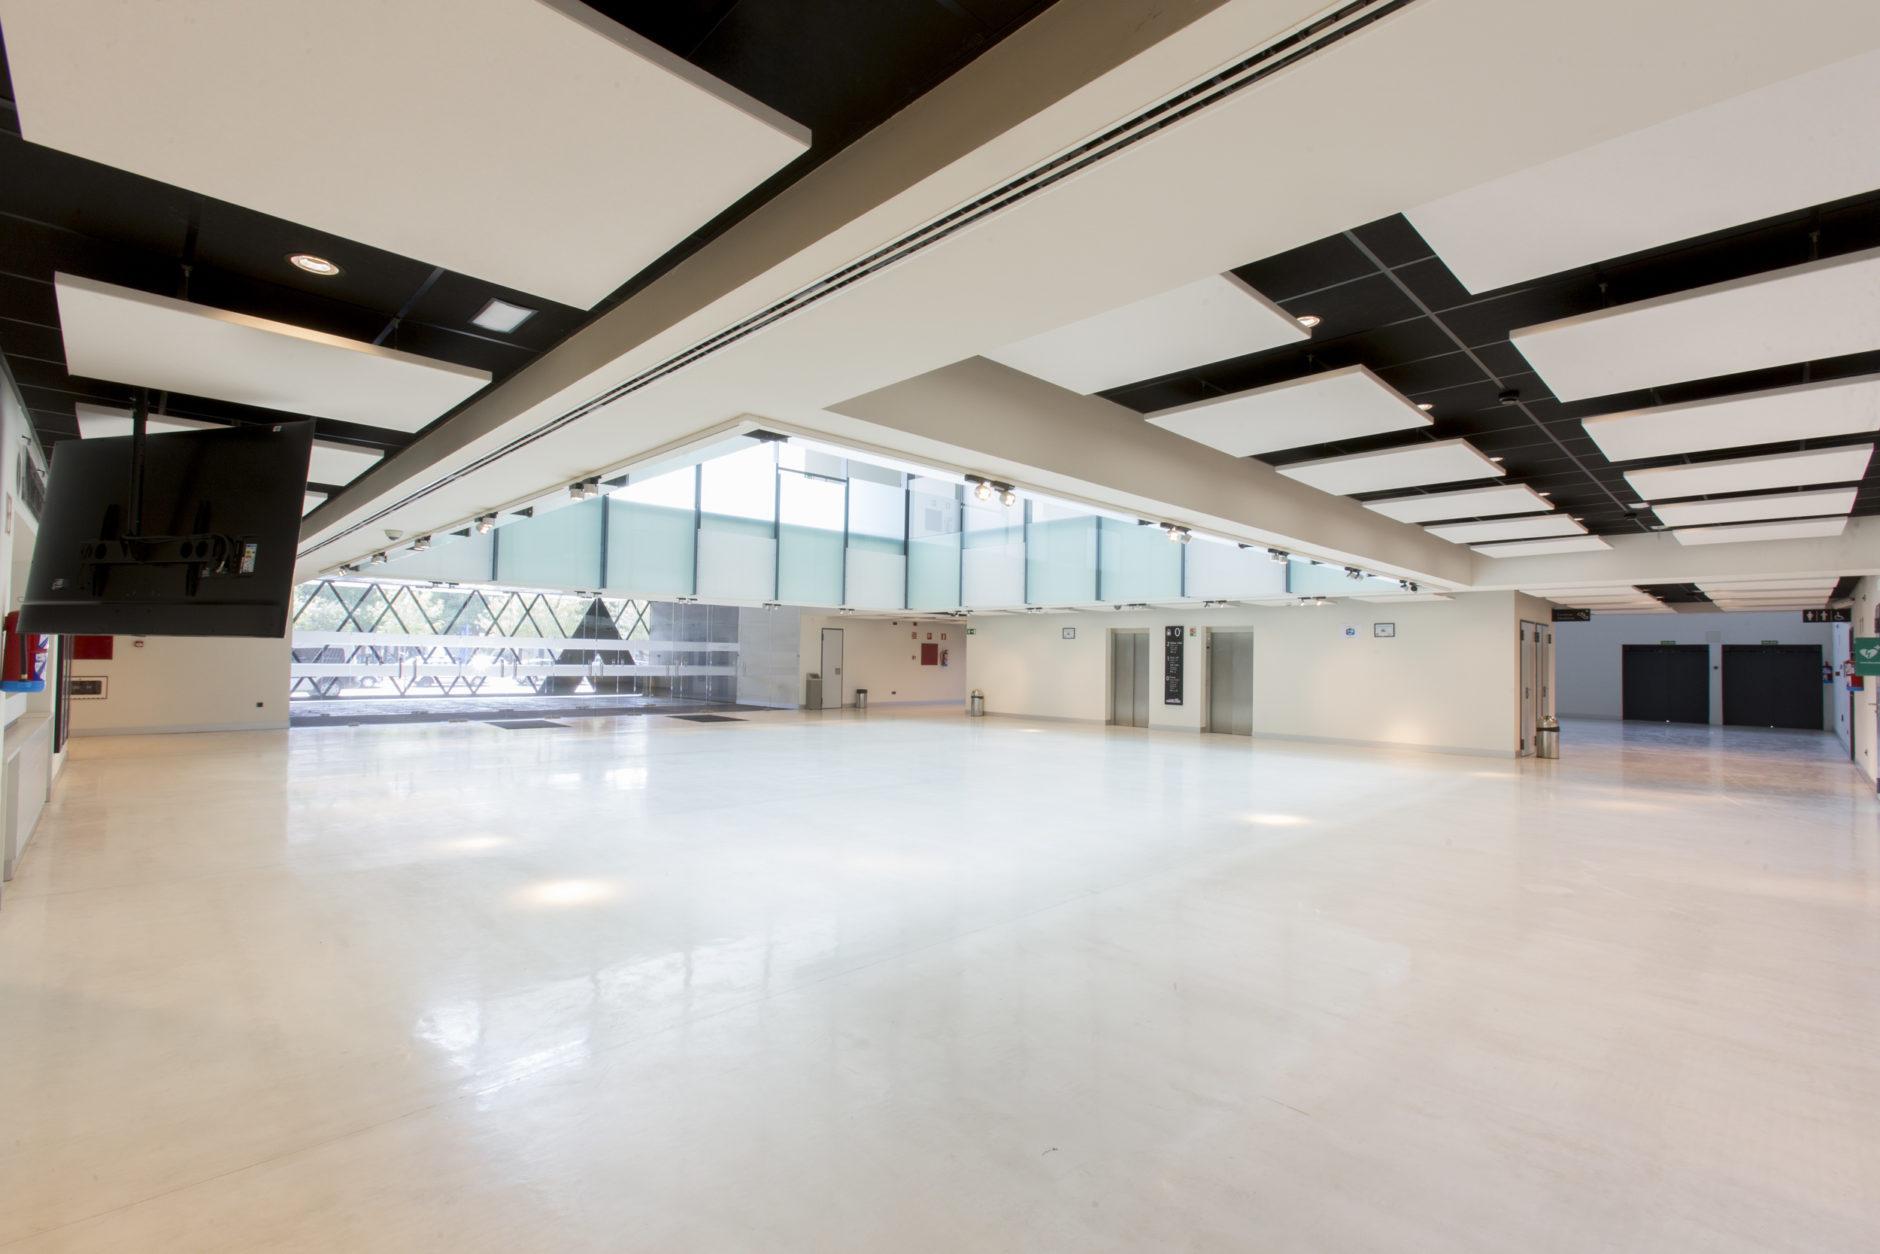 Gran Hall 1